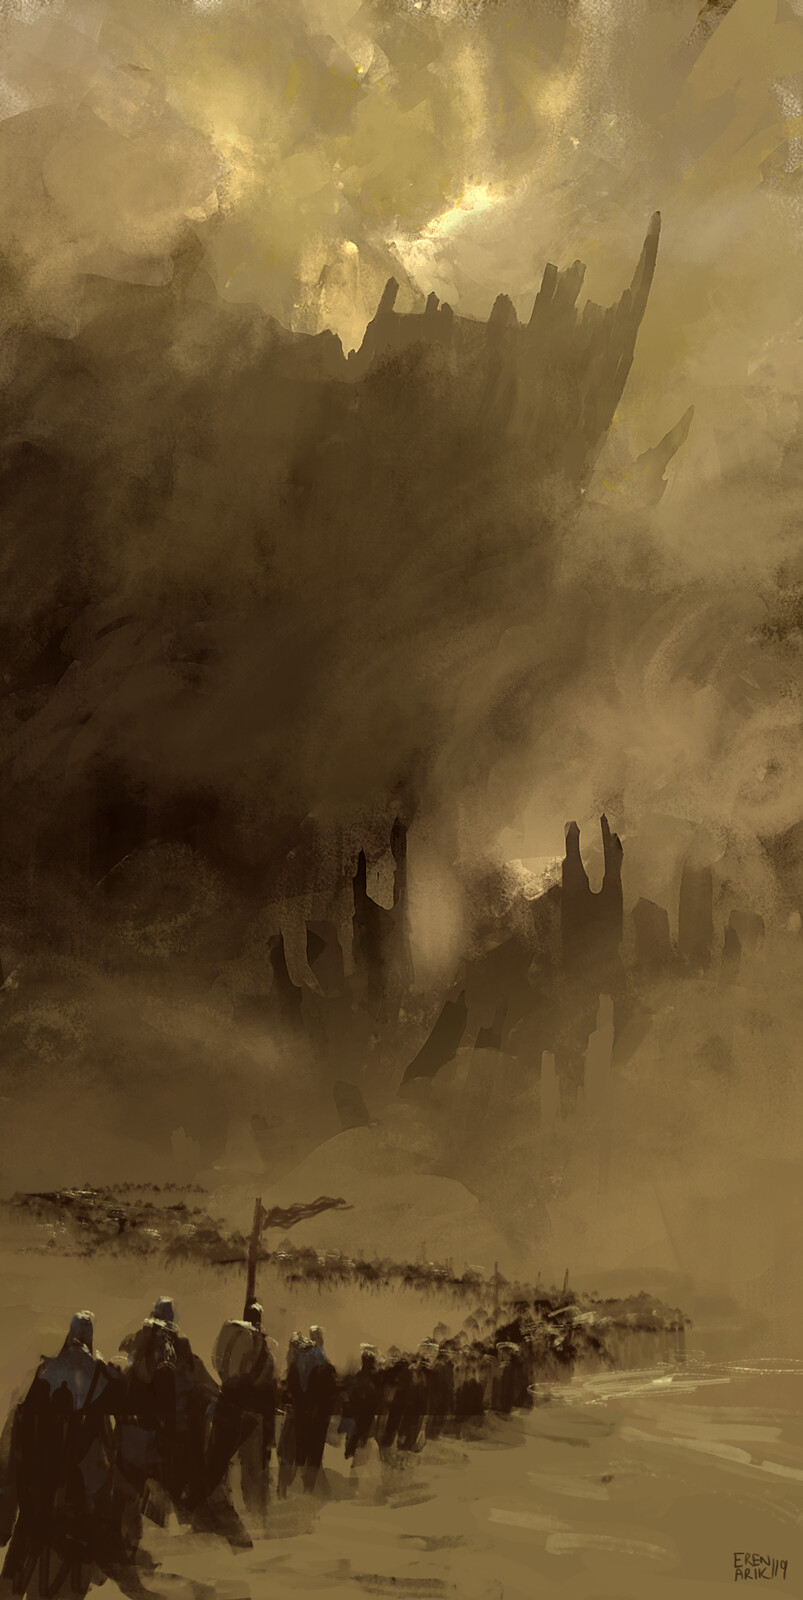 eren-arik-dustcloud.jpg